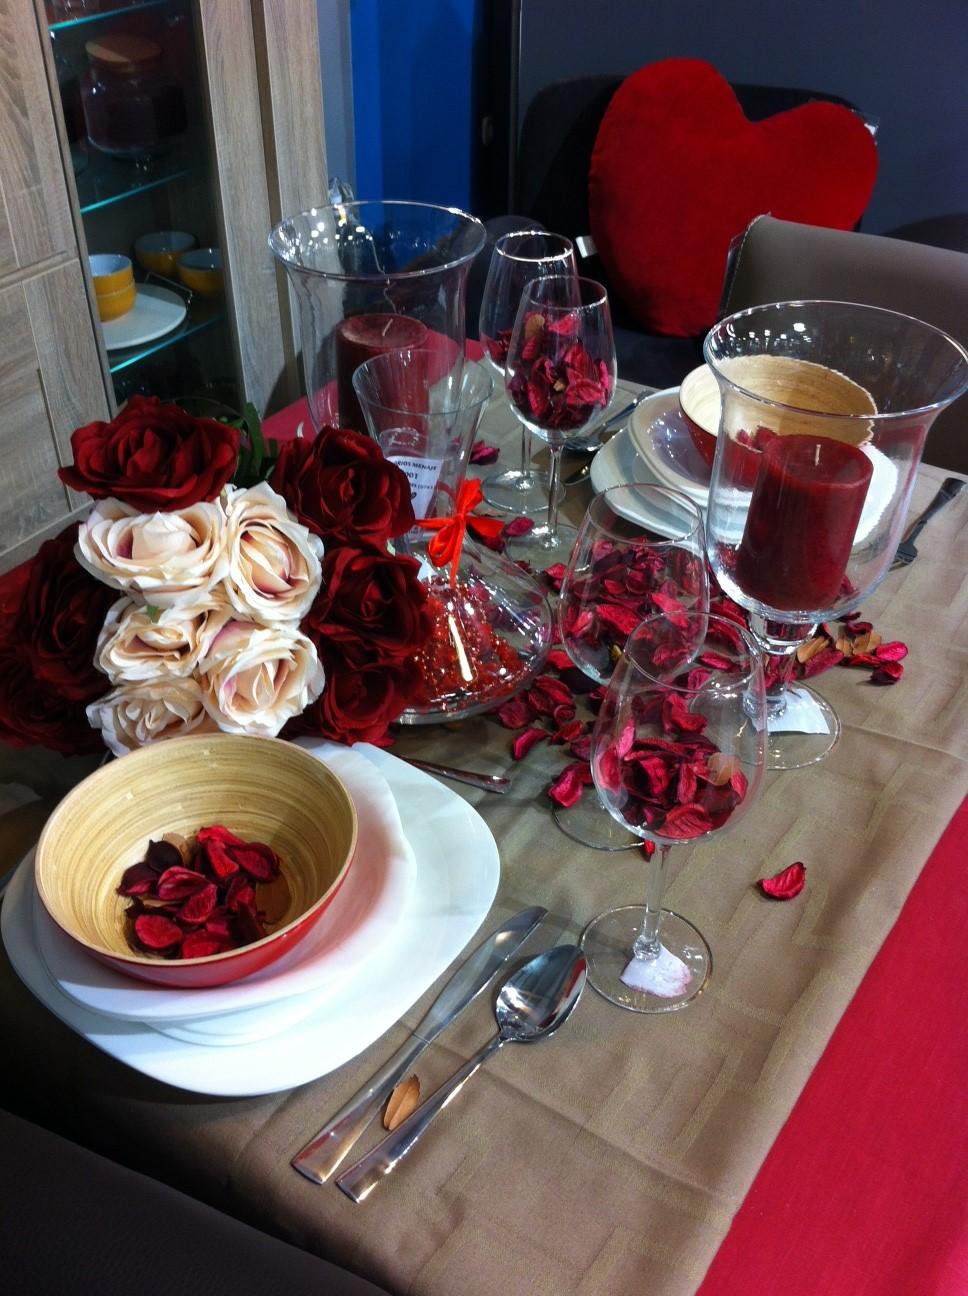 Conforama blog de zenia boulevard - Detalles para cena romantica ...